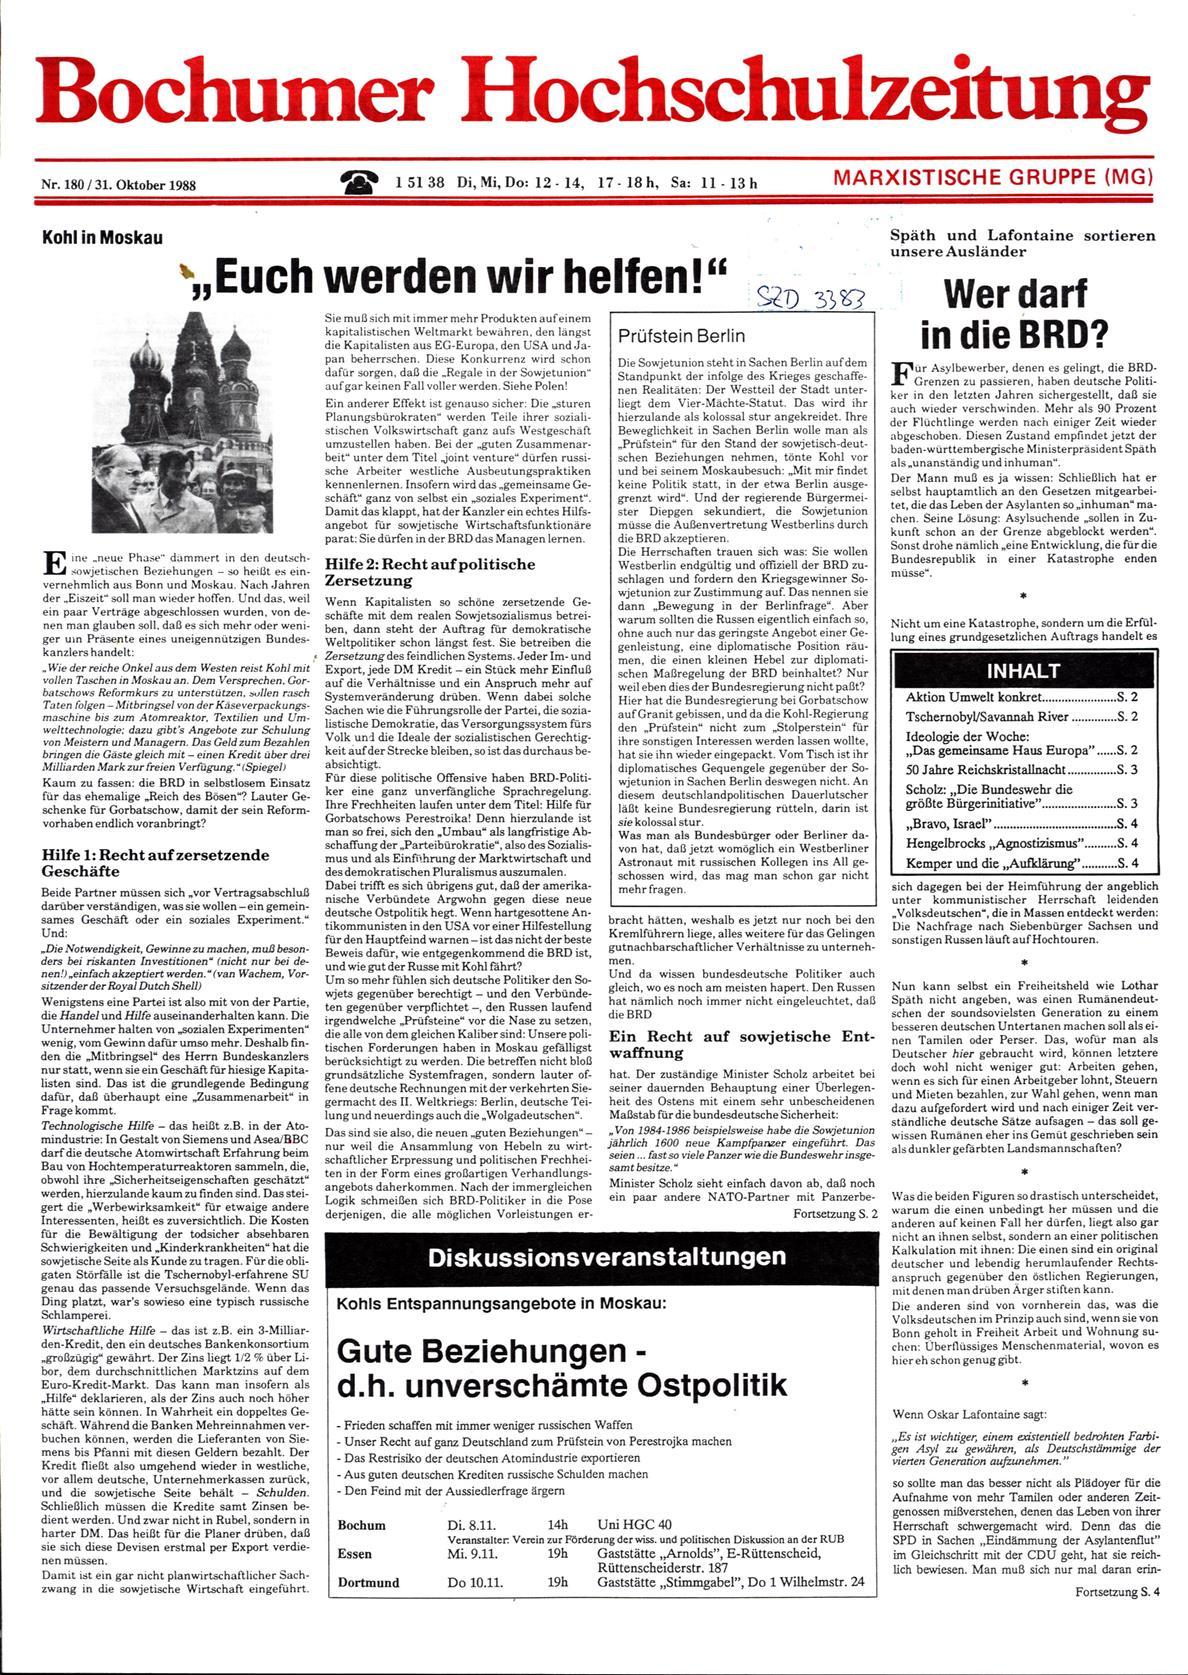 Bochum_BHZ_19881031_180_001